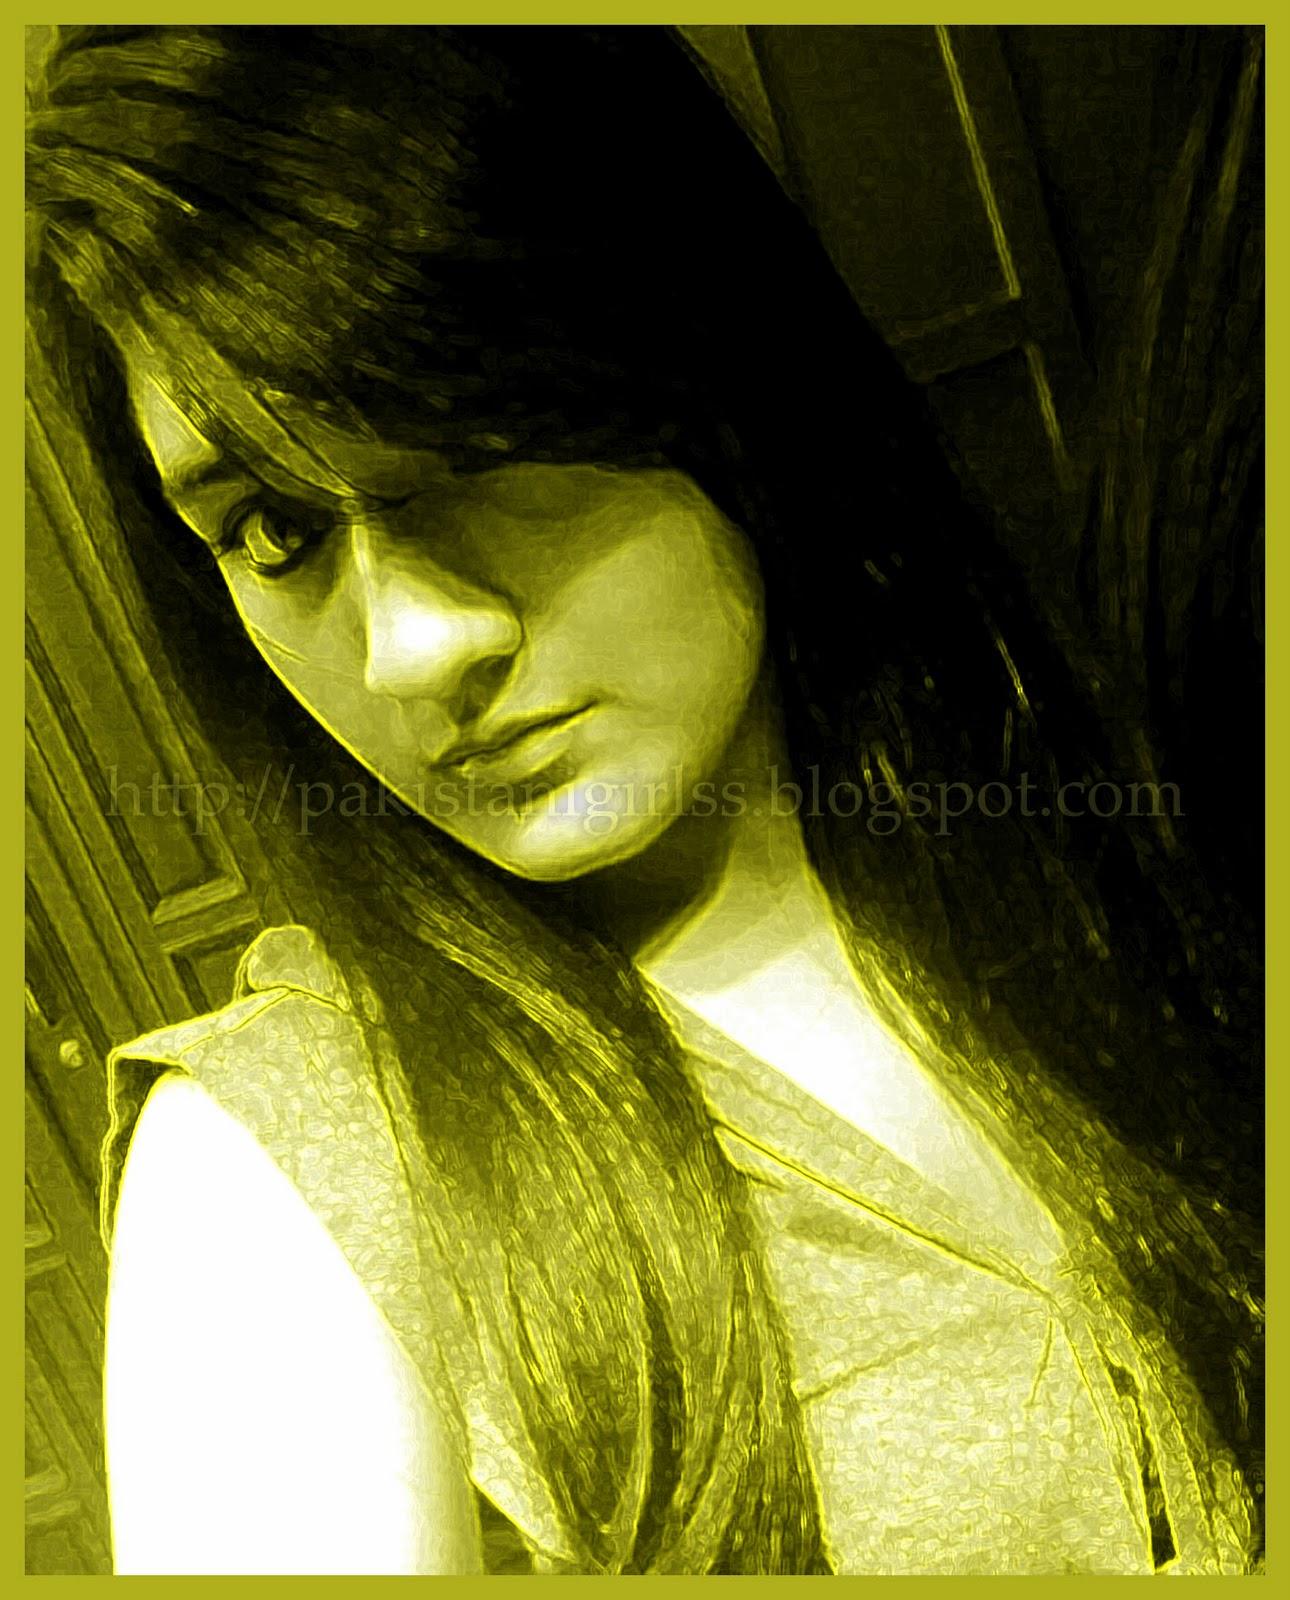 http://1.bp.blogspot.com/_BnJCazT8EBU/TPouYOl1_UI/AAAAAAAAACE/qiksyI2VvBc/s1600/Pakistani+Girl+with+Silky+Hairs.jpg